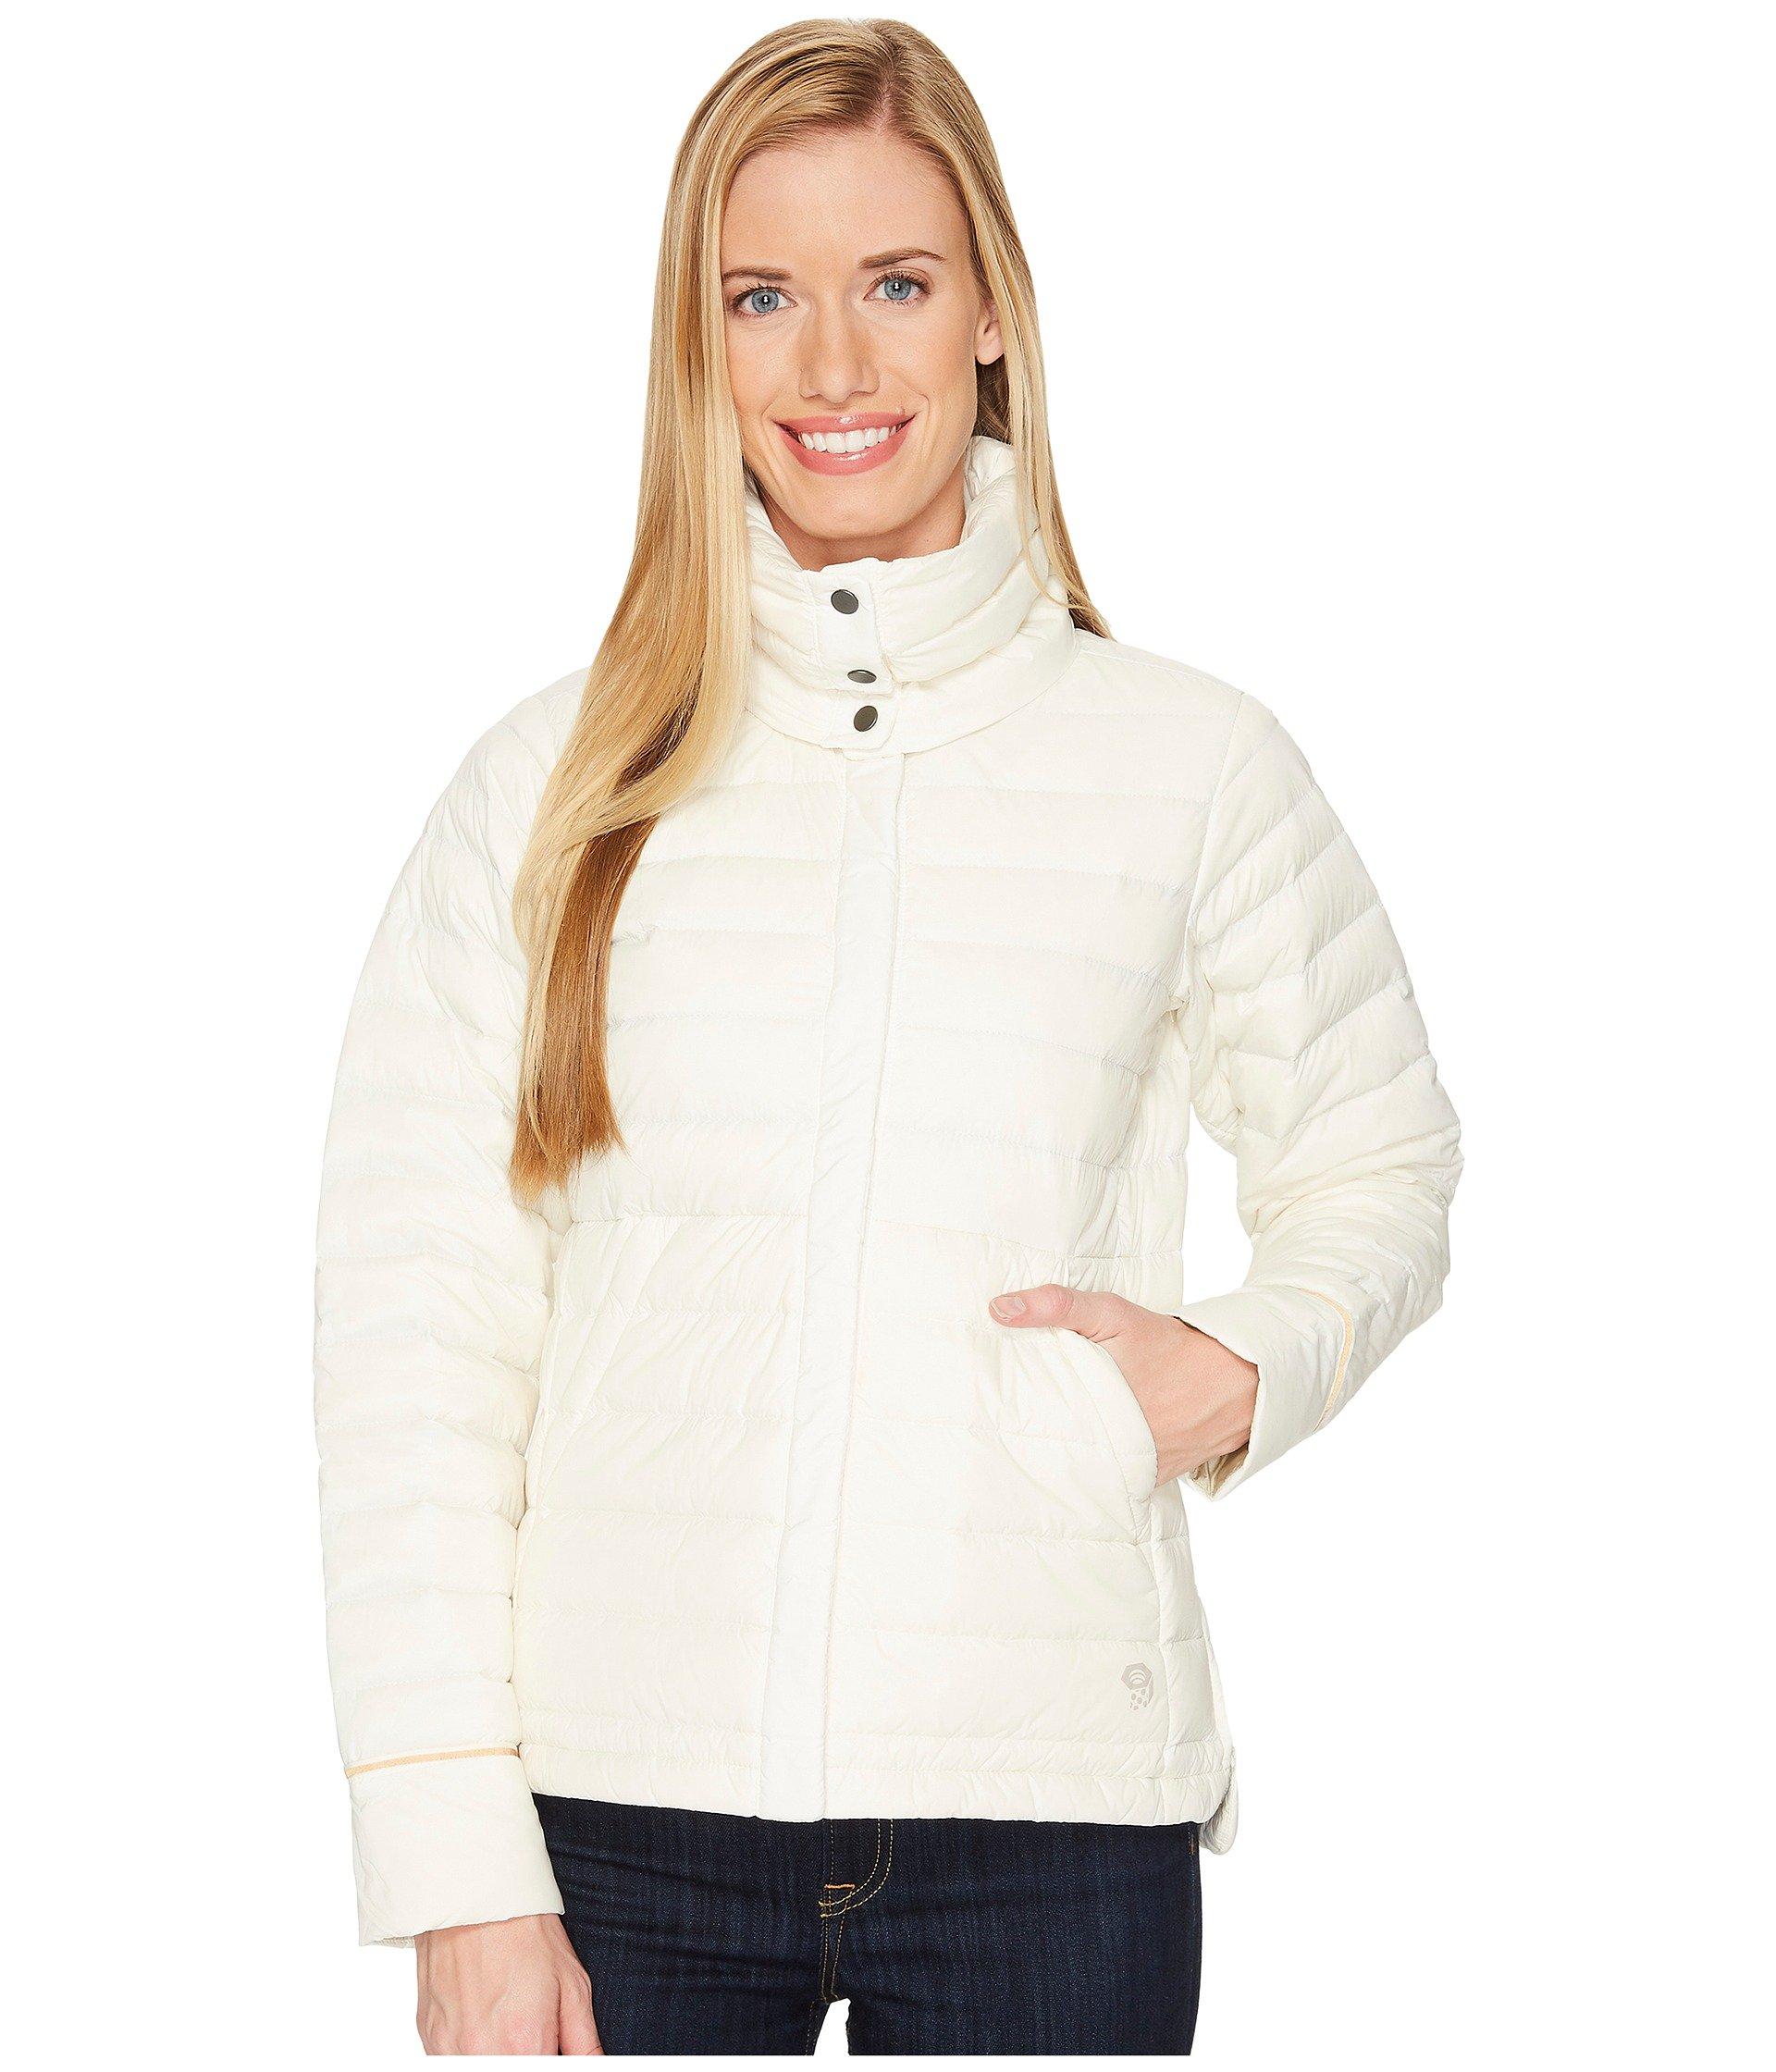 MOUNTAIN HARDWEAR Packdown Jacket, Cotton